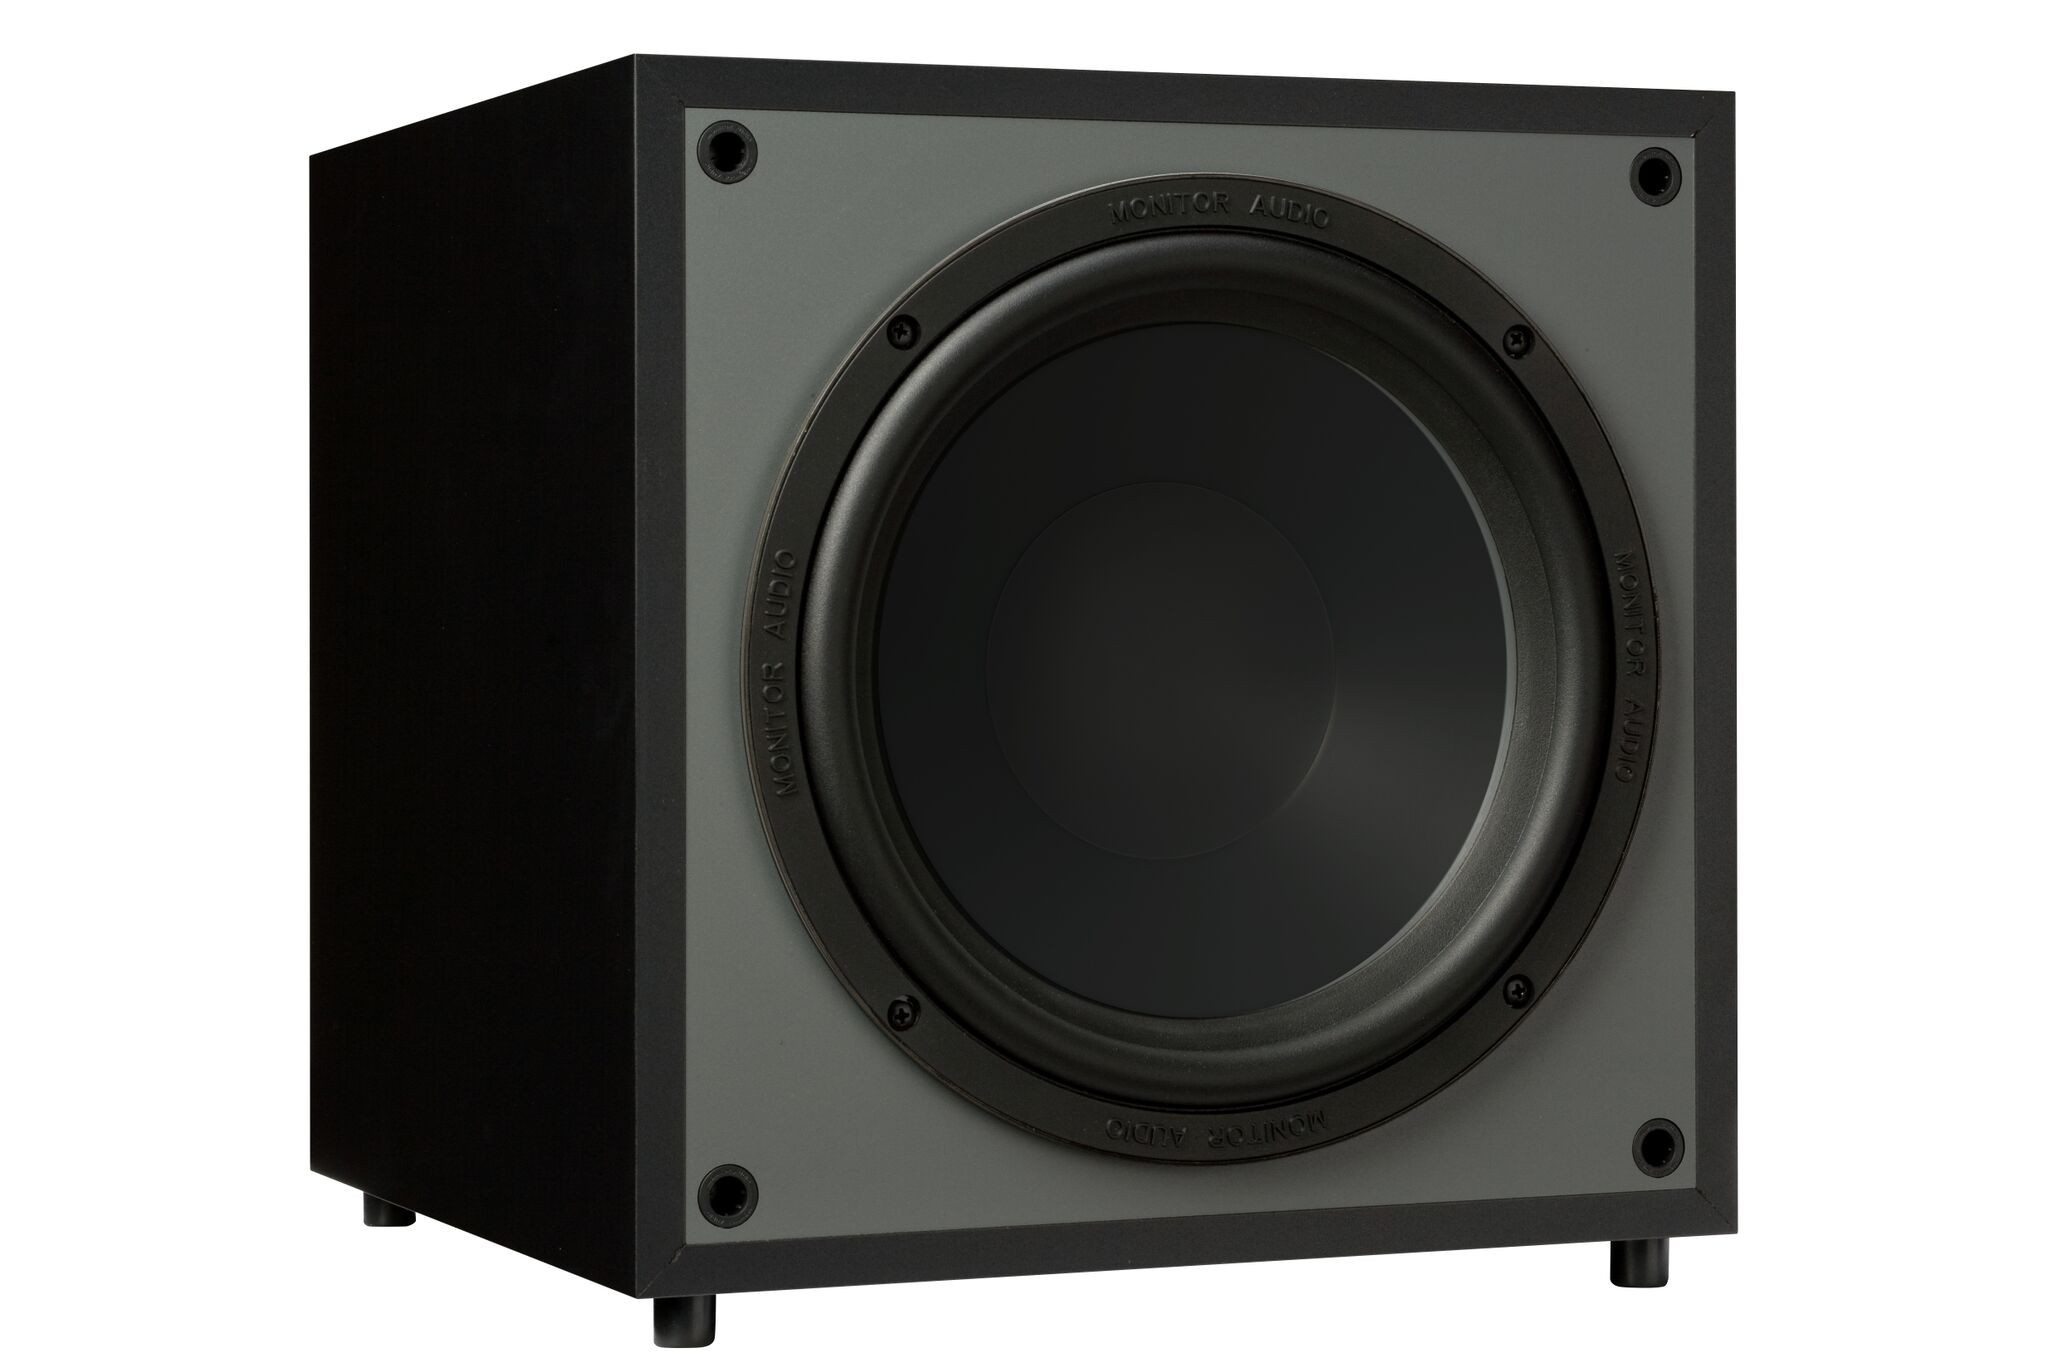 Сабвуфер Monitor Audio Monitor MRW-10 3G Black Oak -